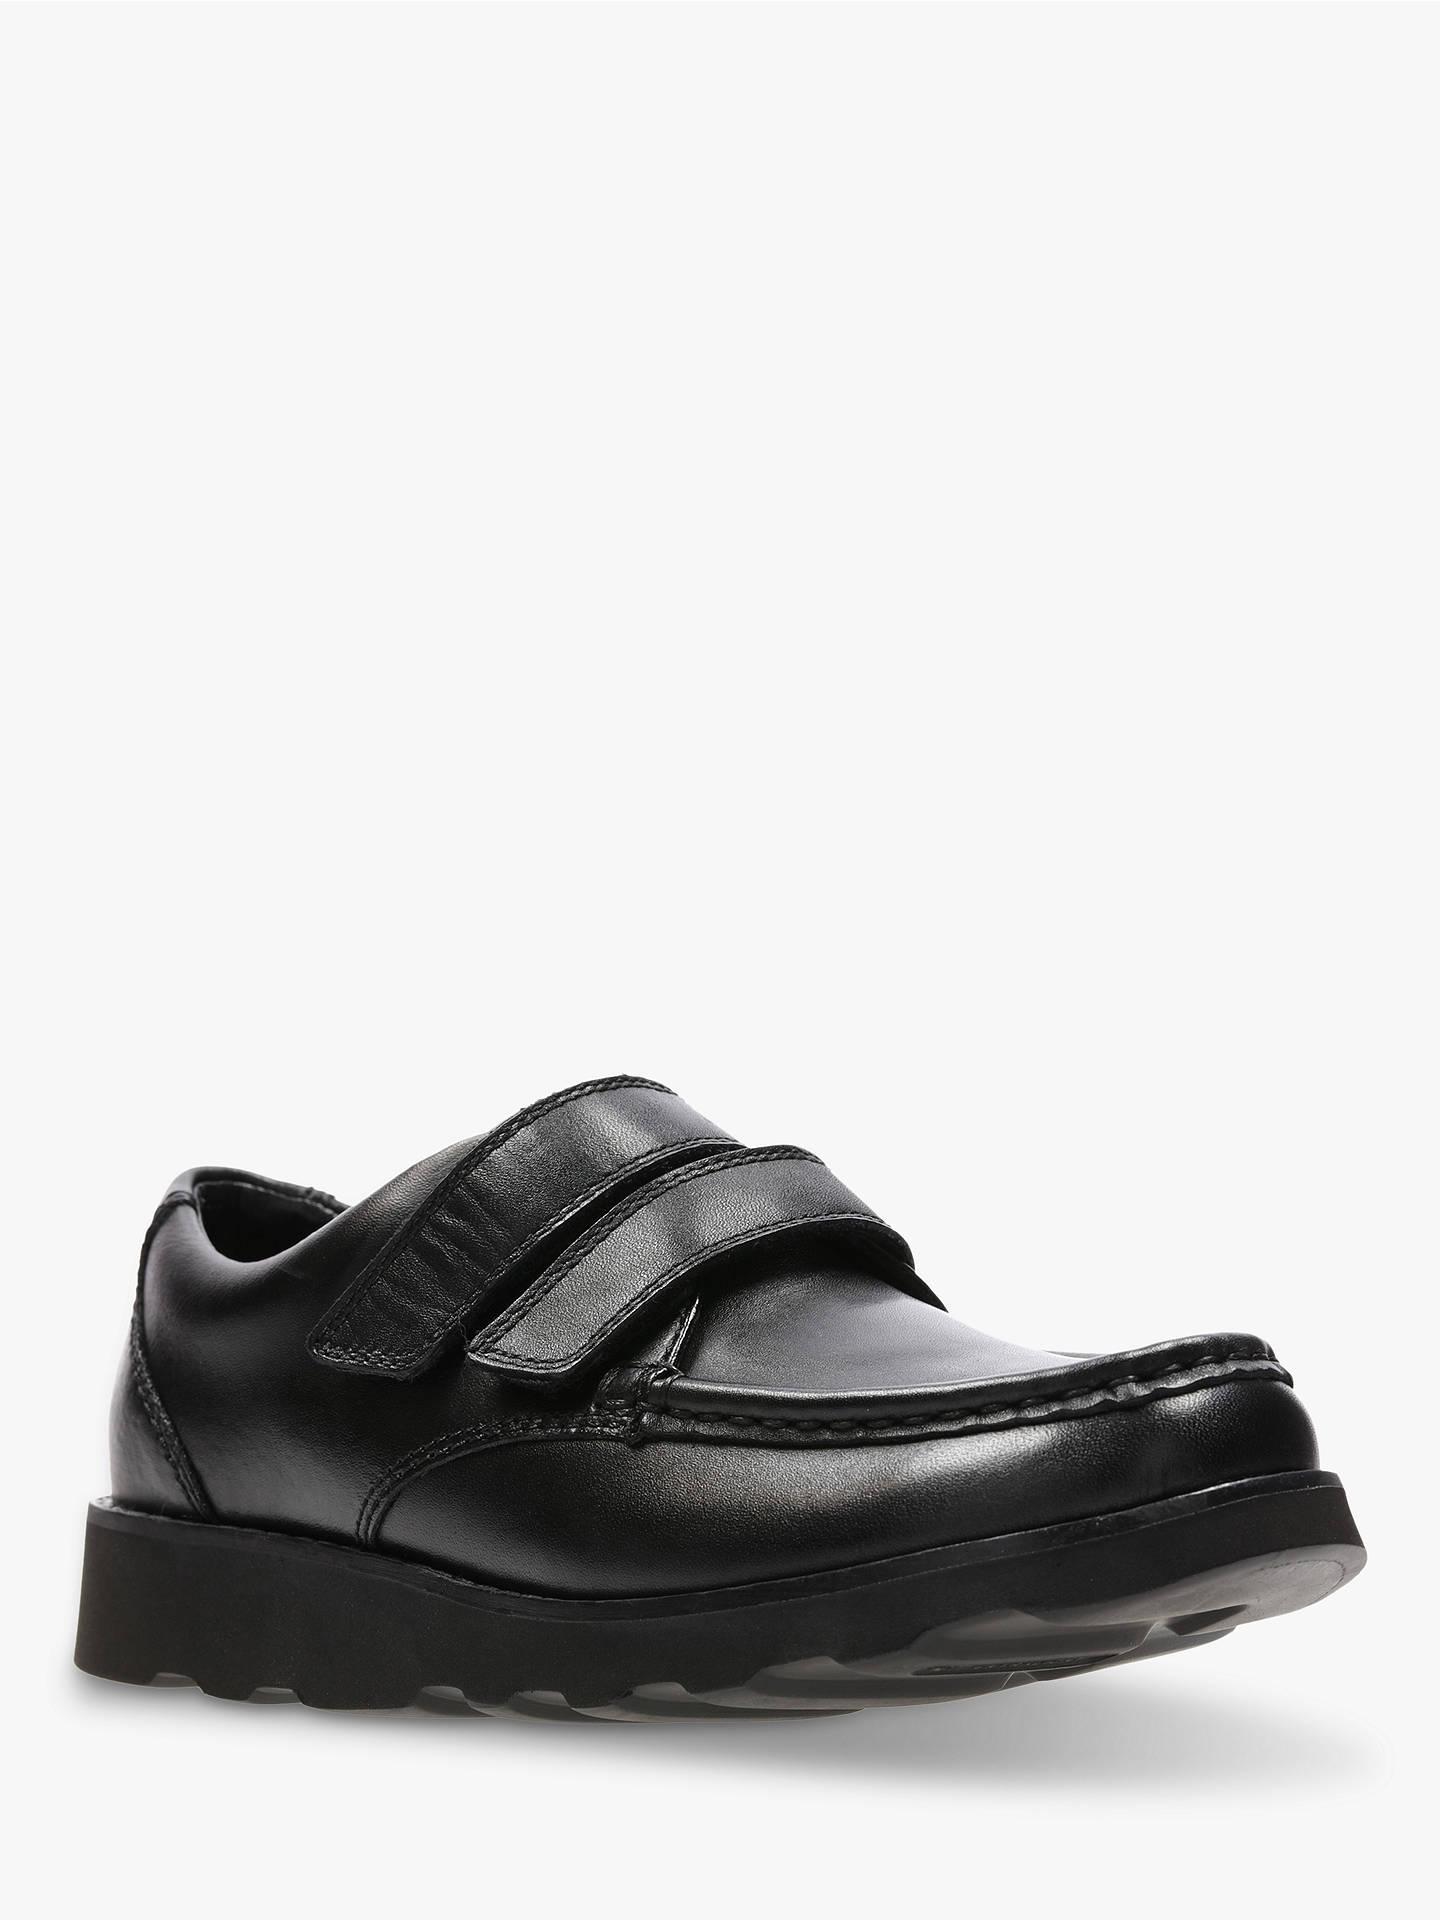 Clarks Girls Black Leather School Shoes infant size 10,10.5,11,11.5,12,12.5,13 F